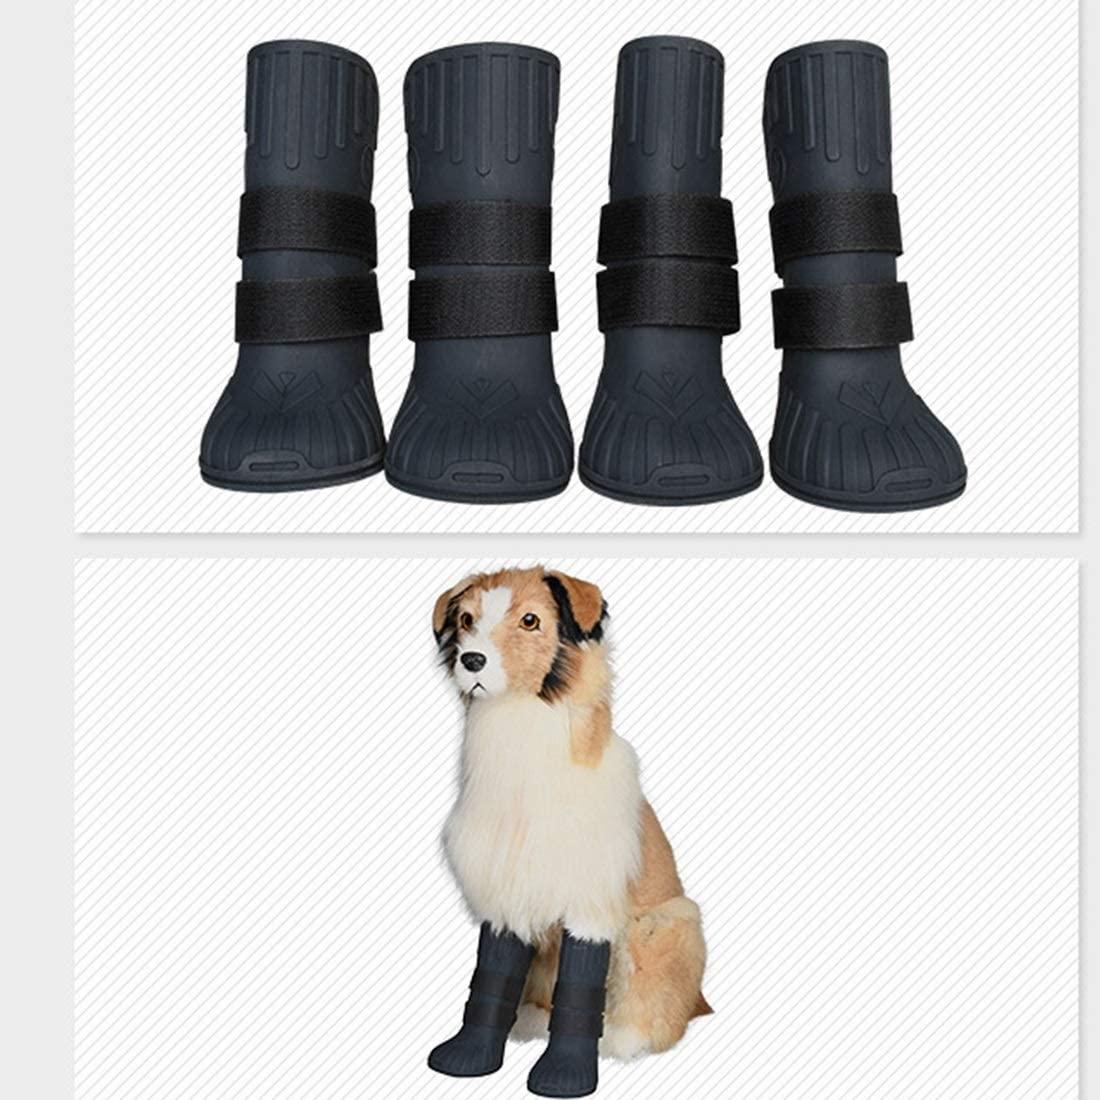 Botas de Lluvia para Mascotas Botas de Silicona Botas Grandes para Perros